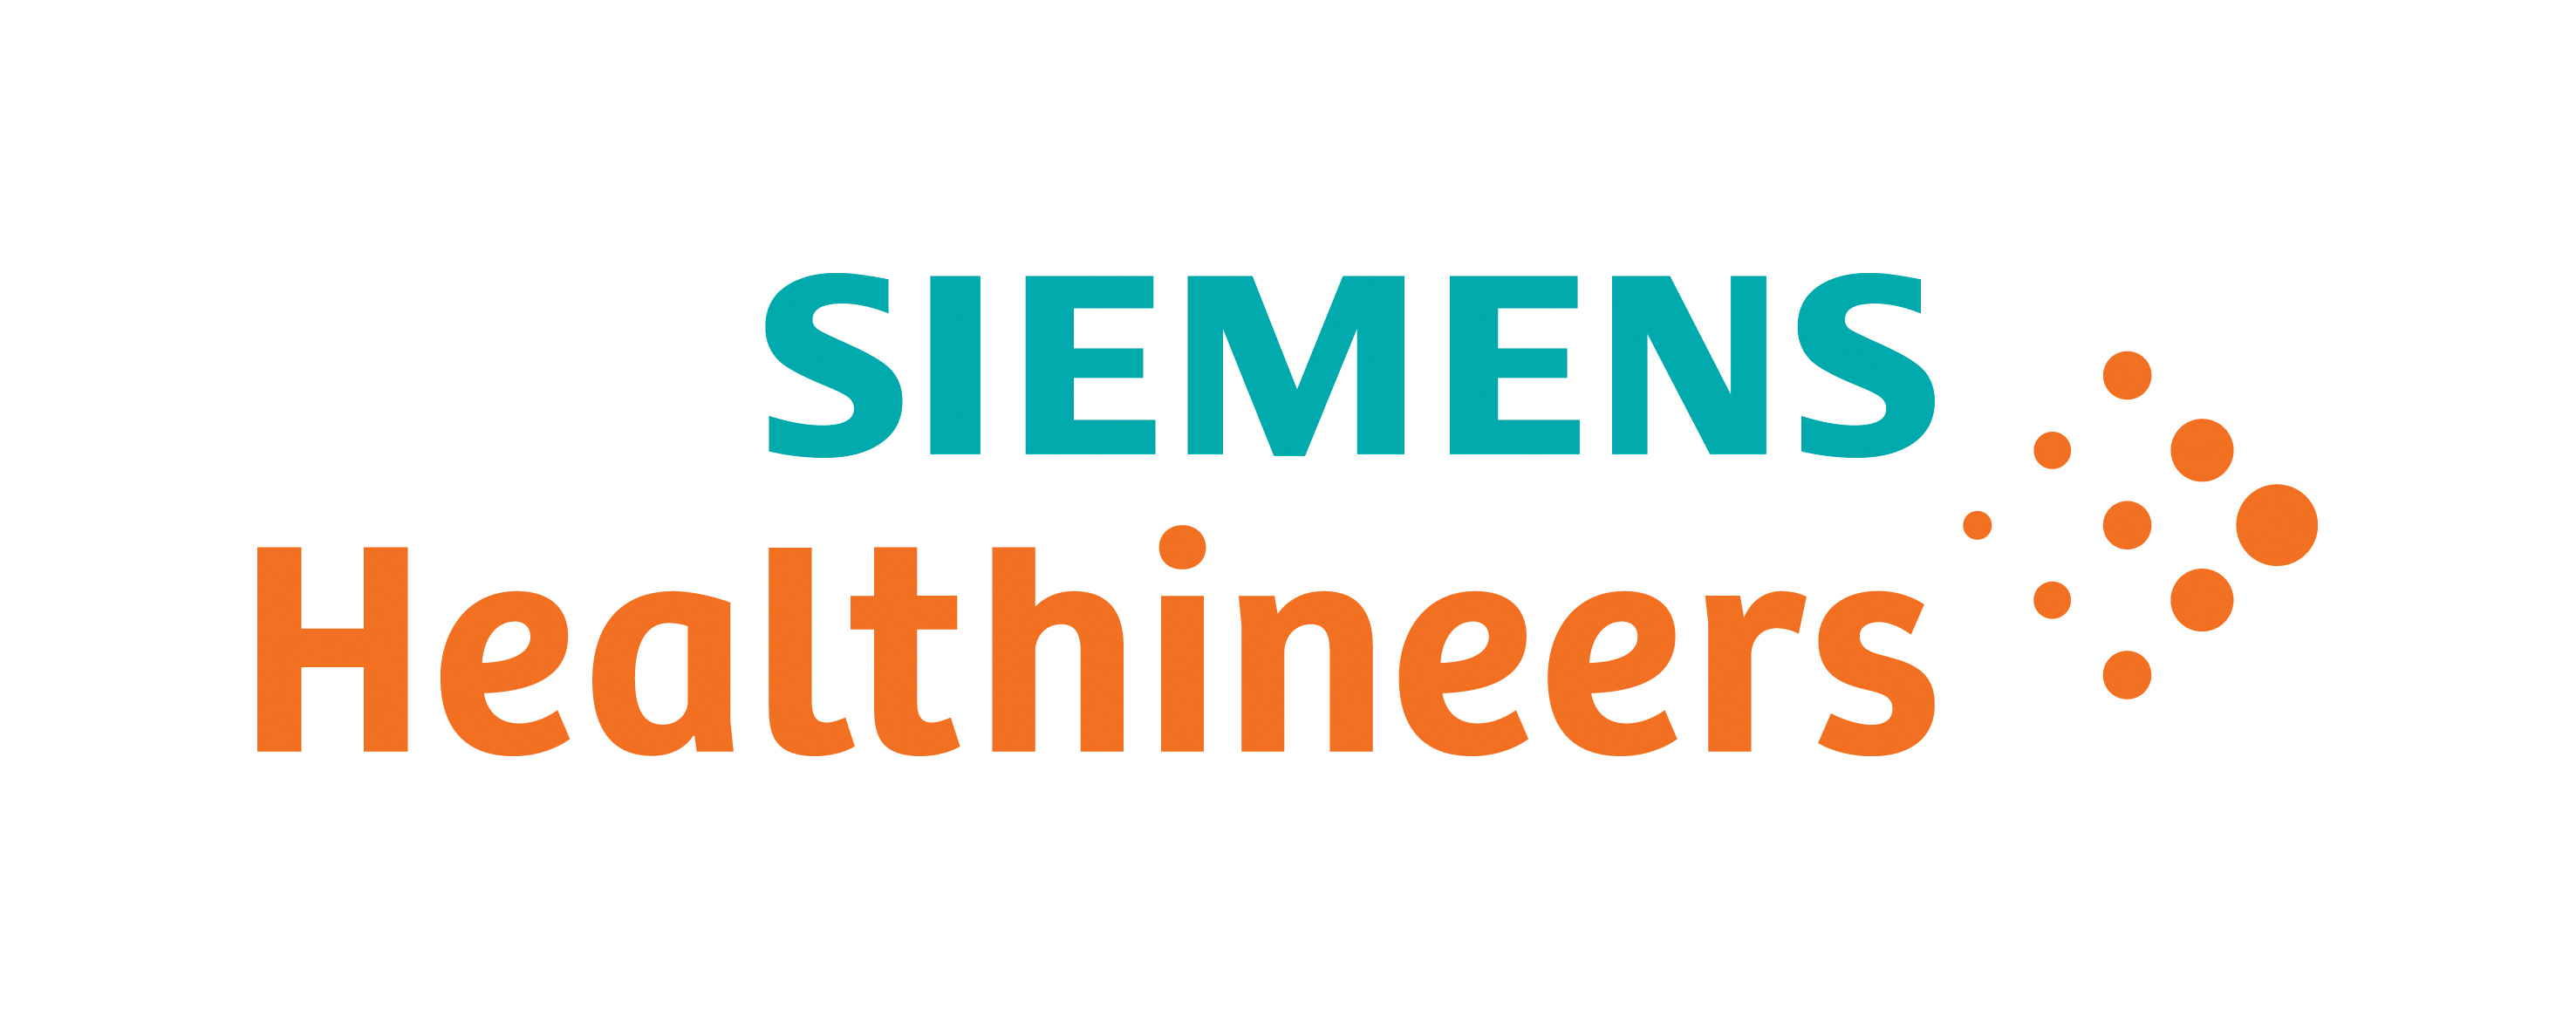 Siemens_Healthineers_Logo_Colour_300dpi